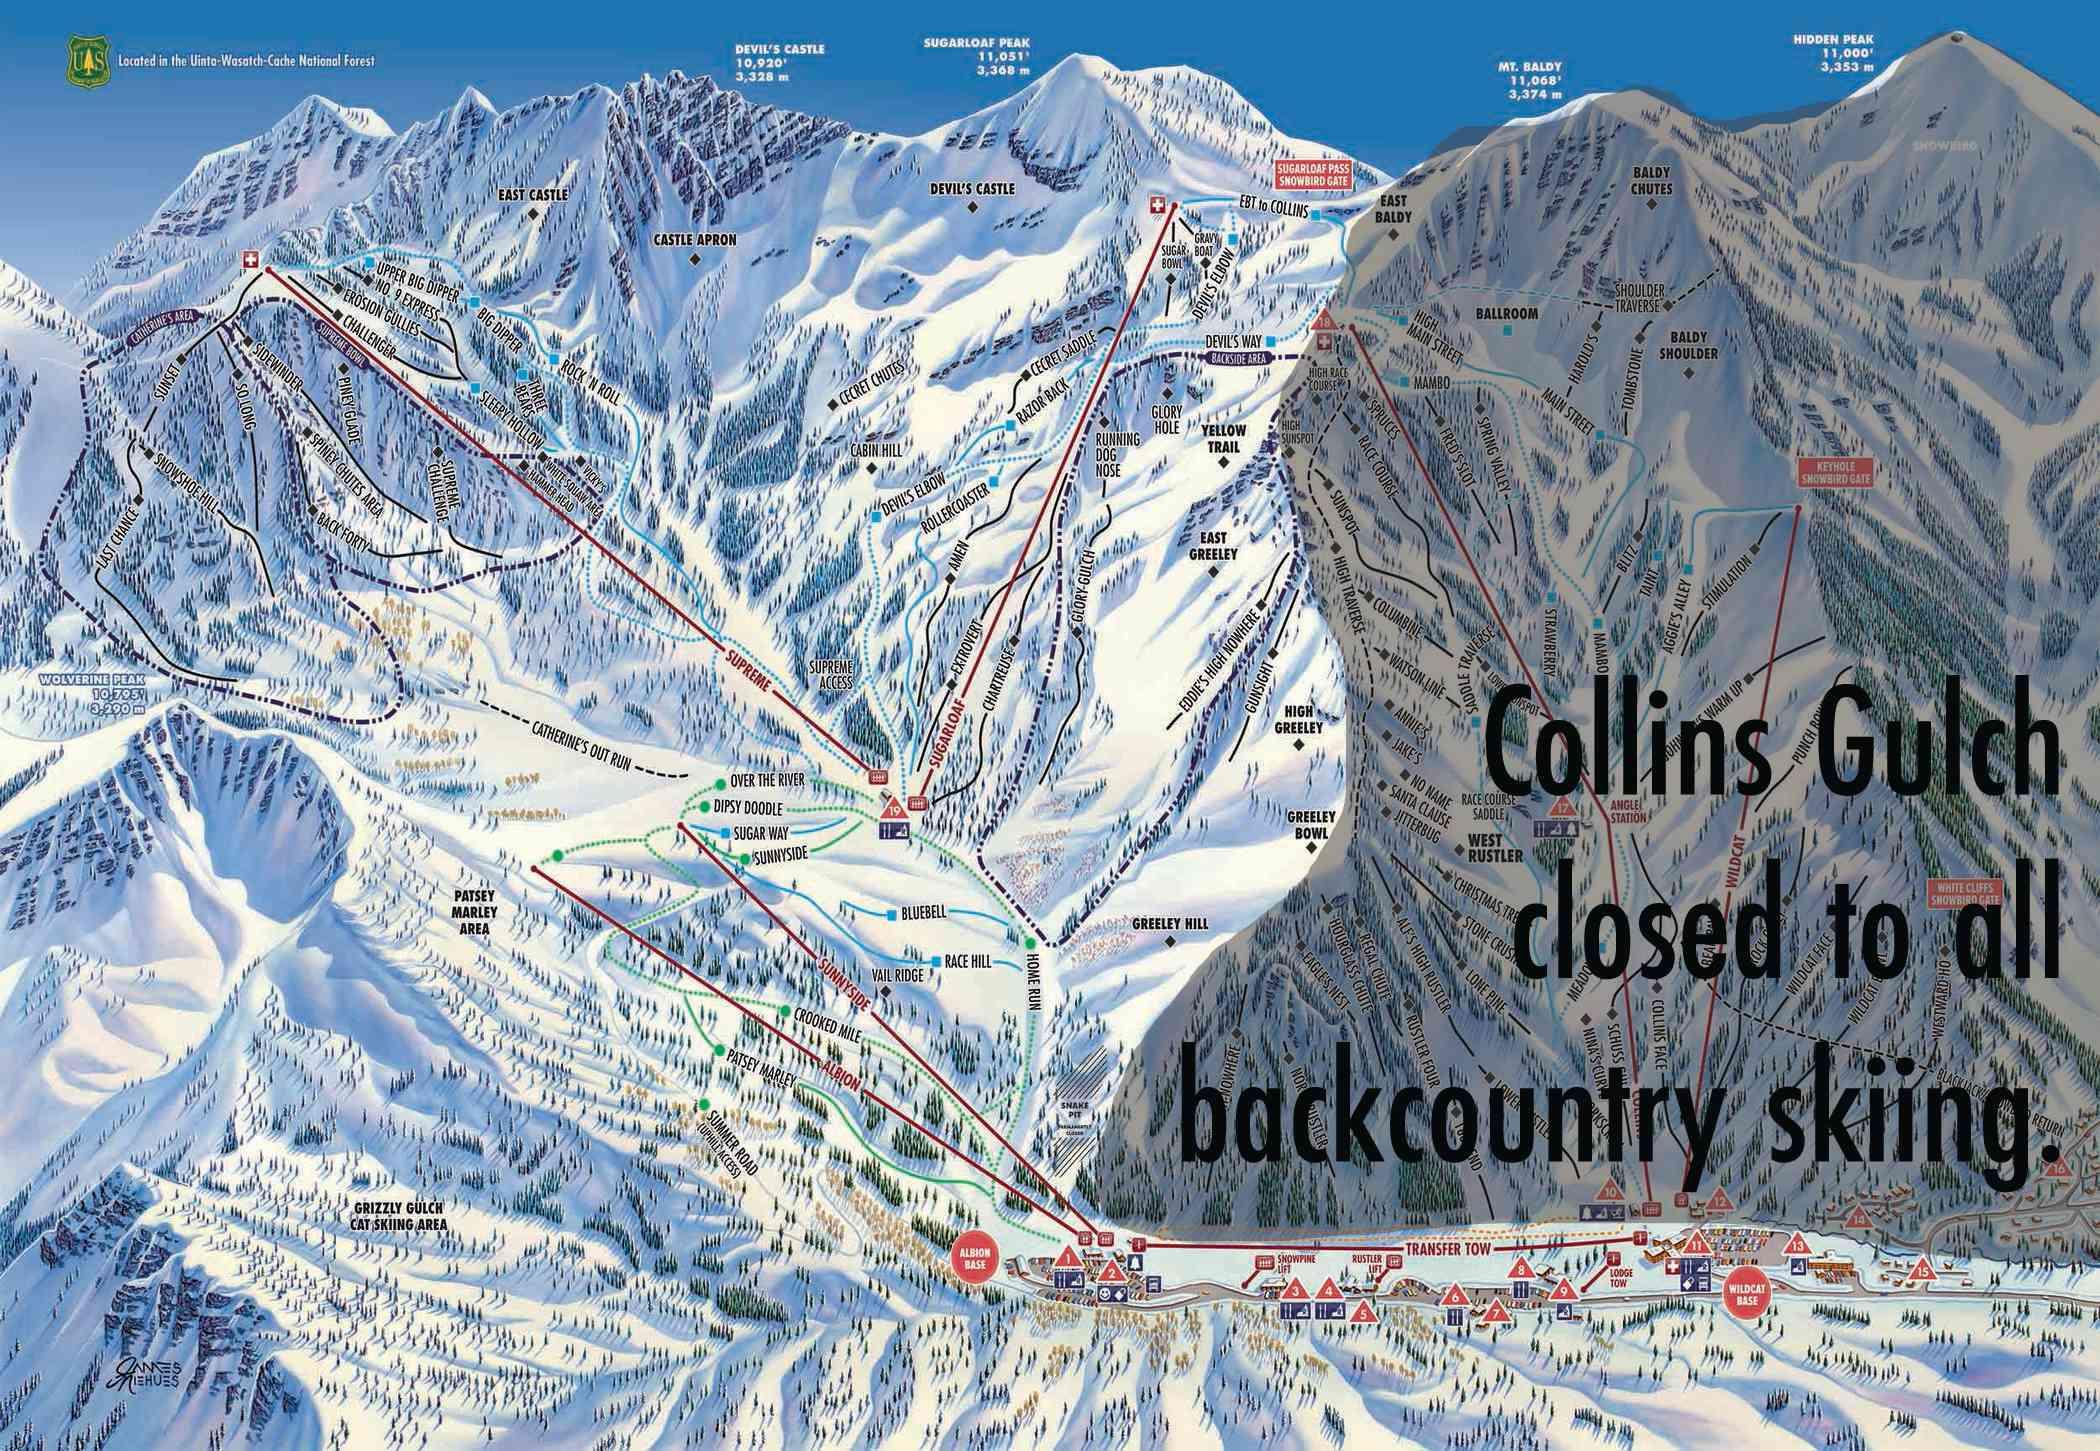 Collins Gulch closed